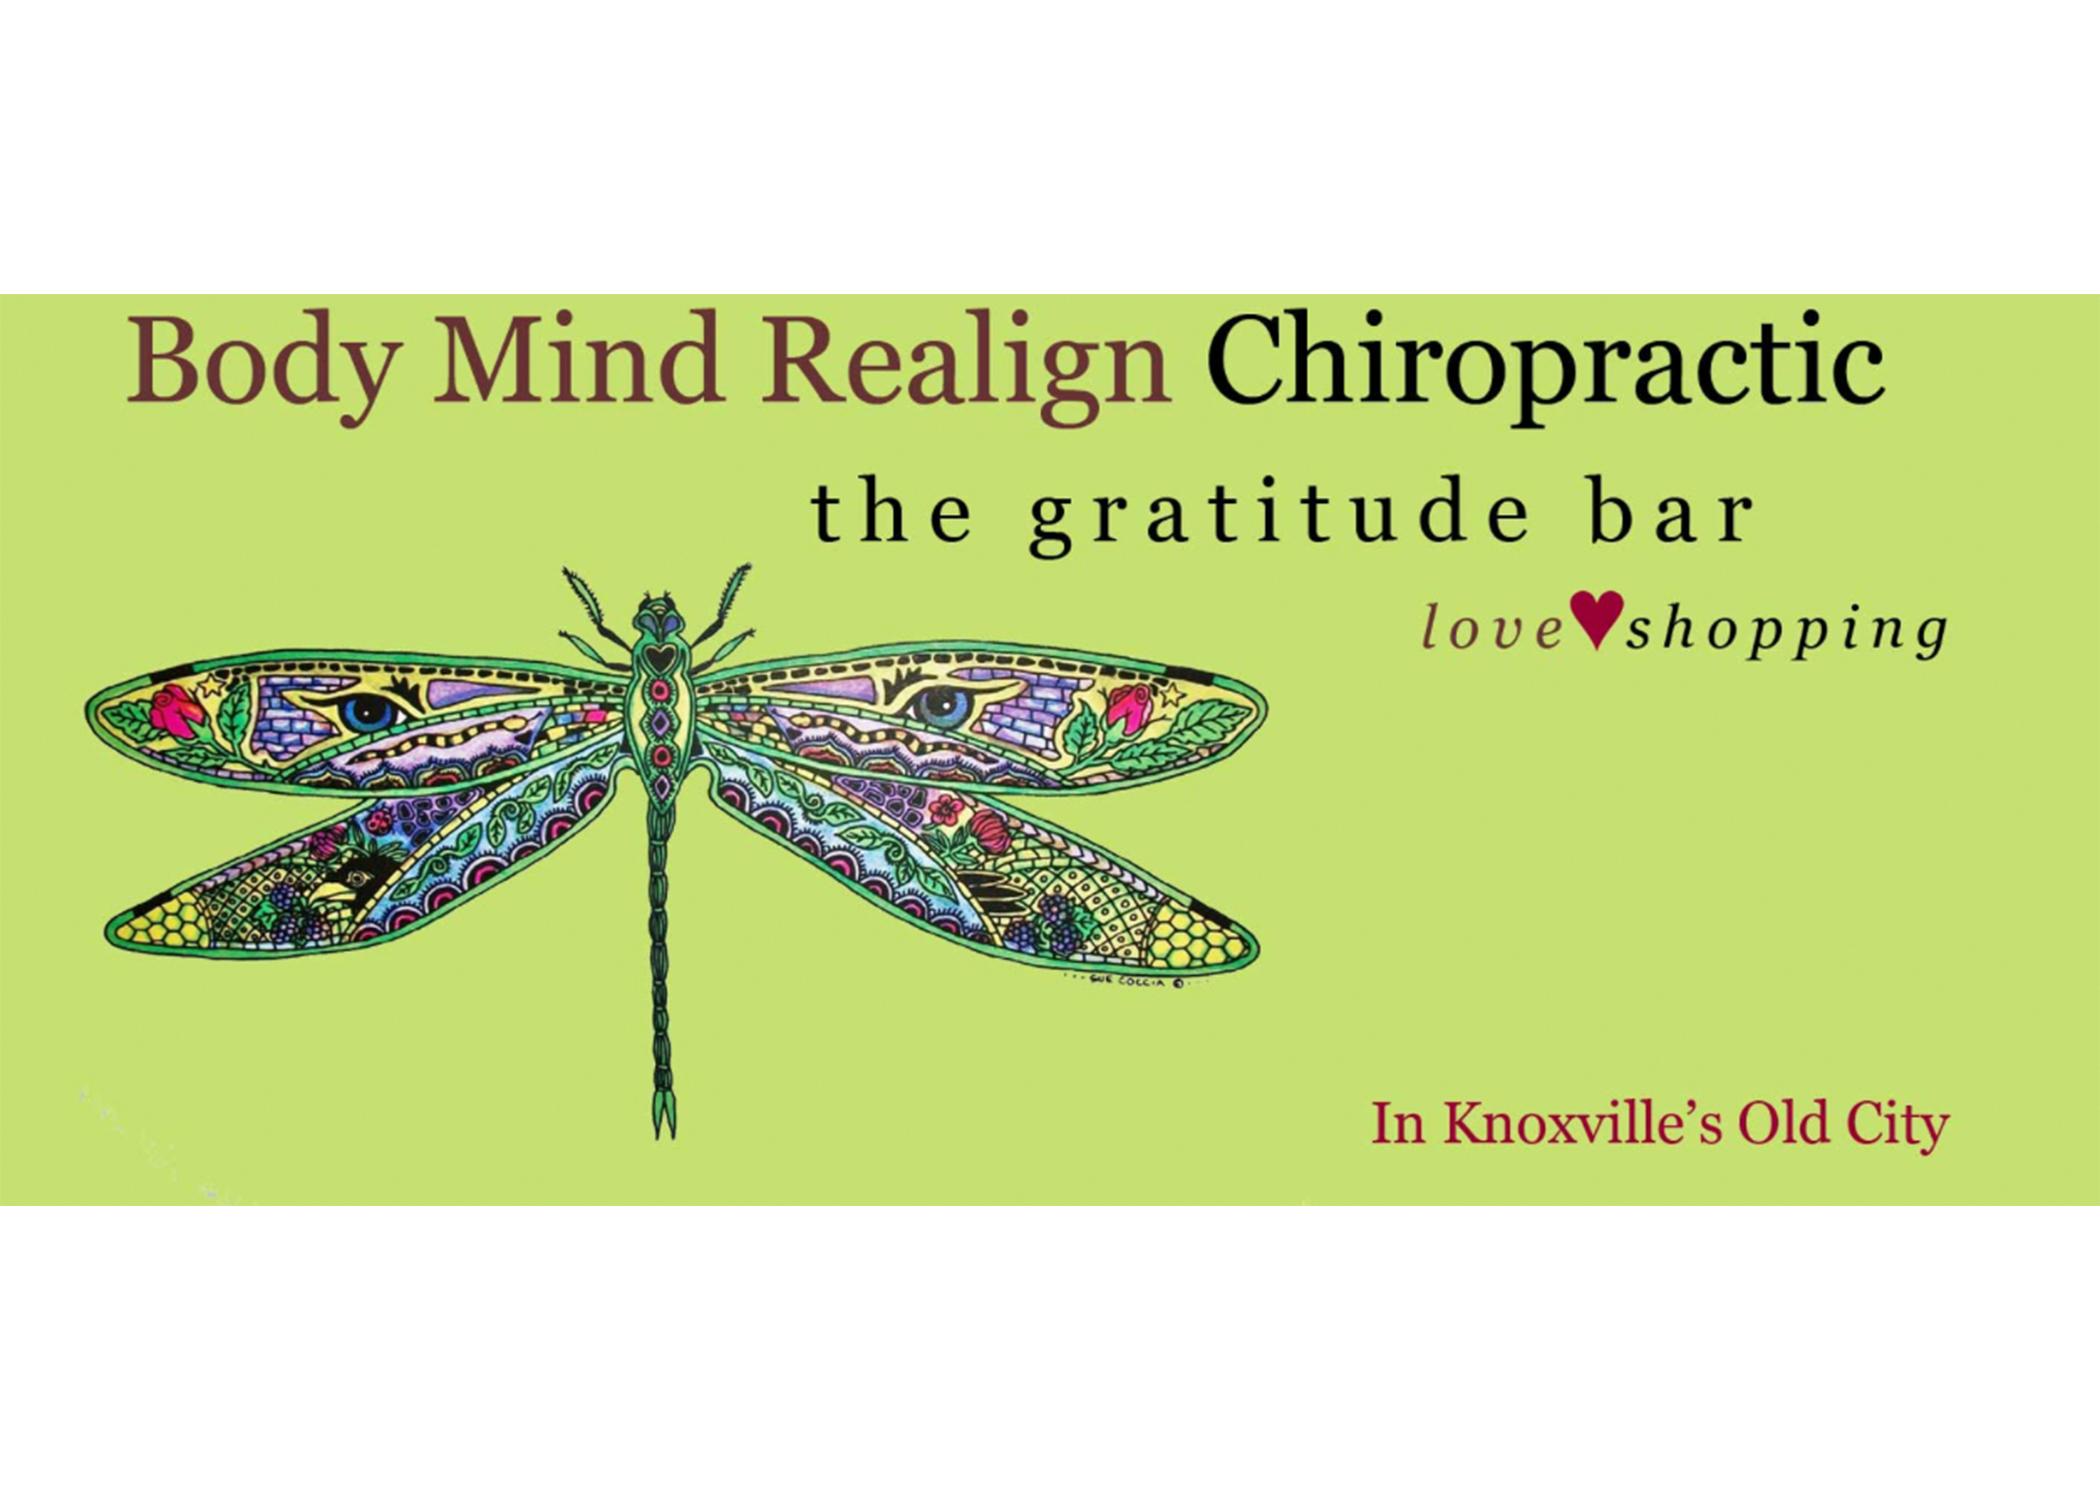 Body Mind Realign